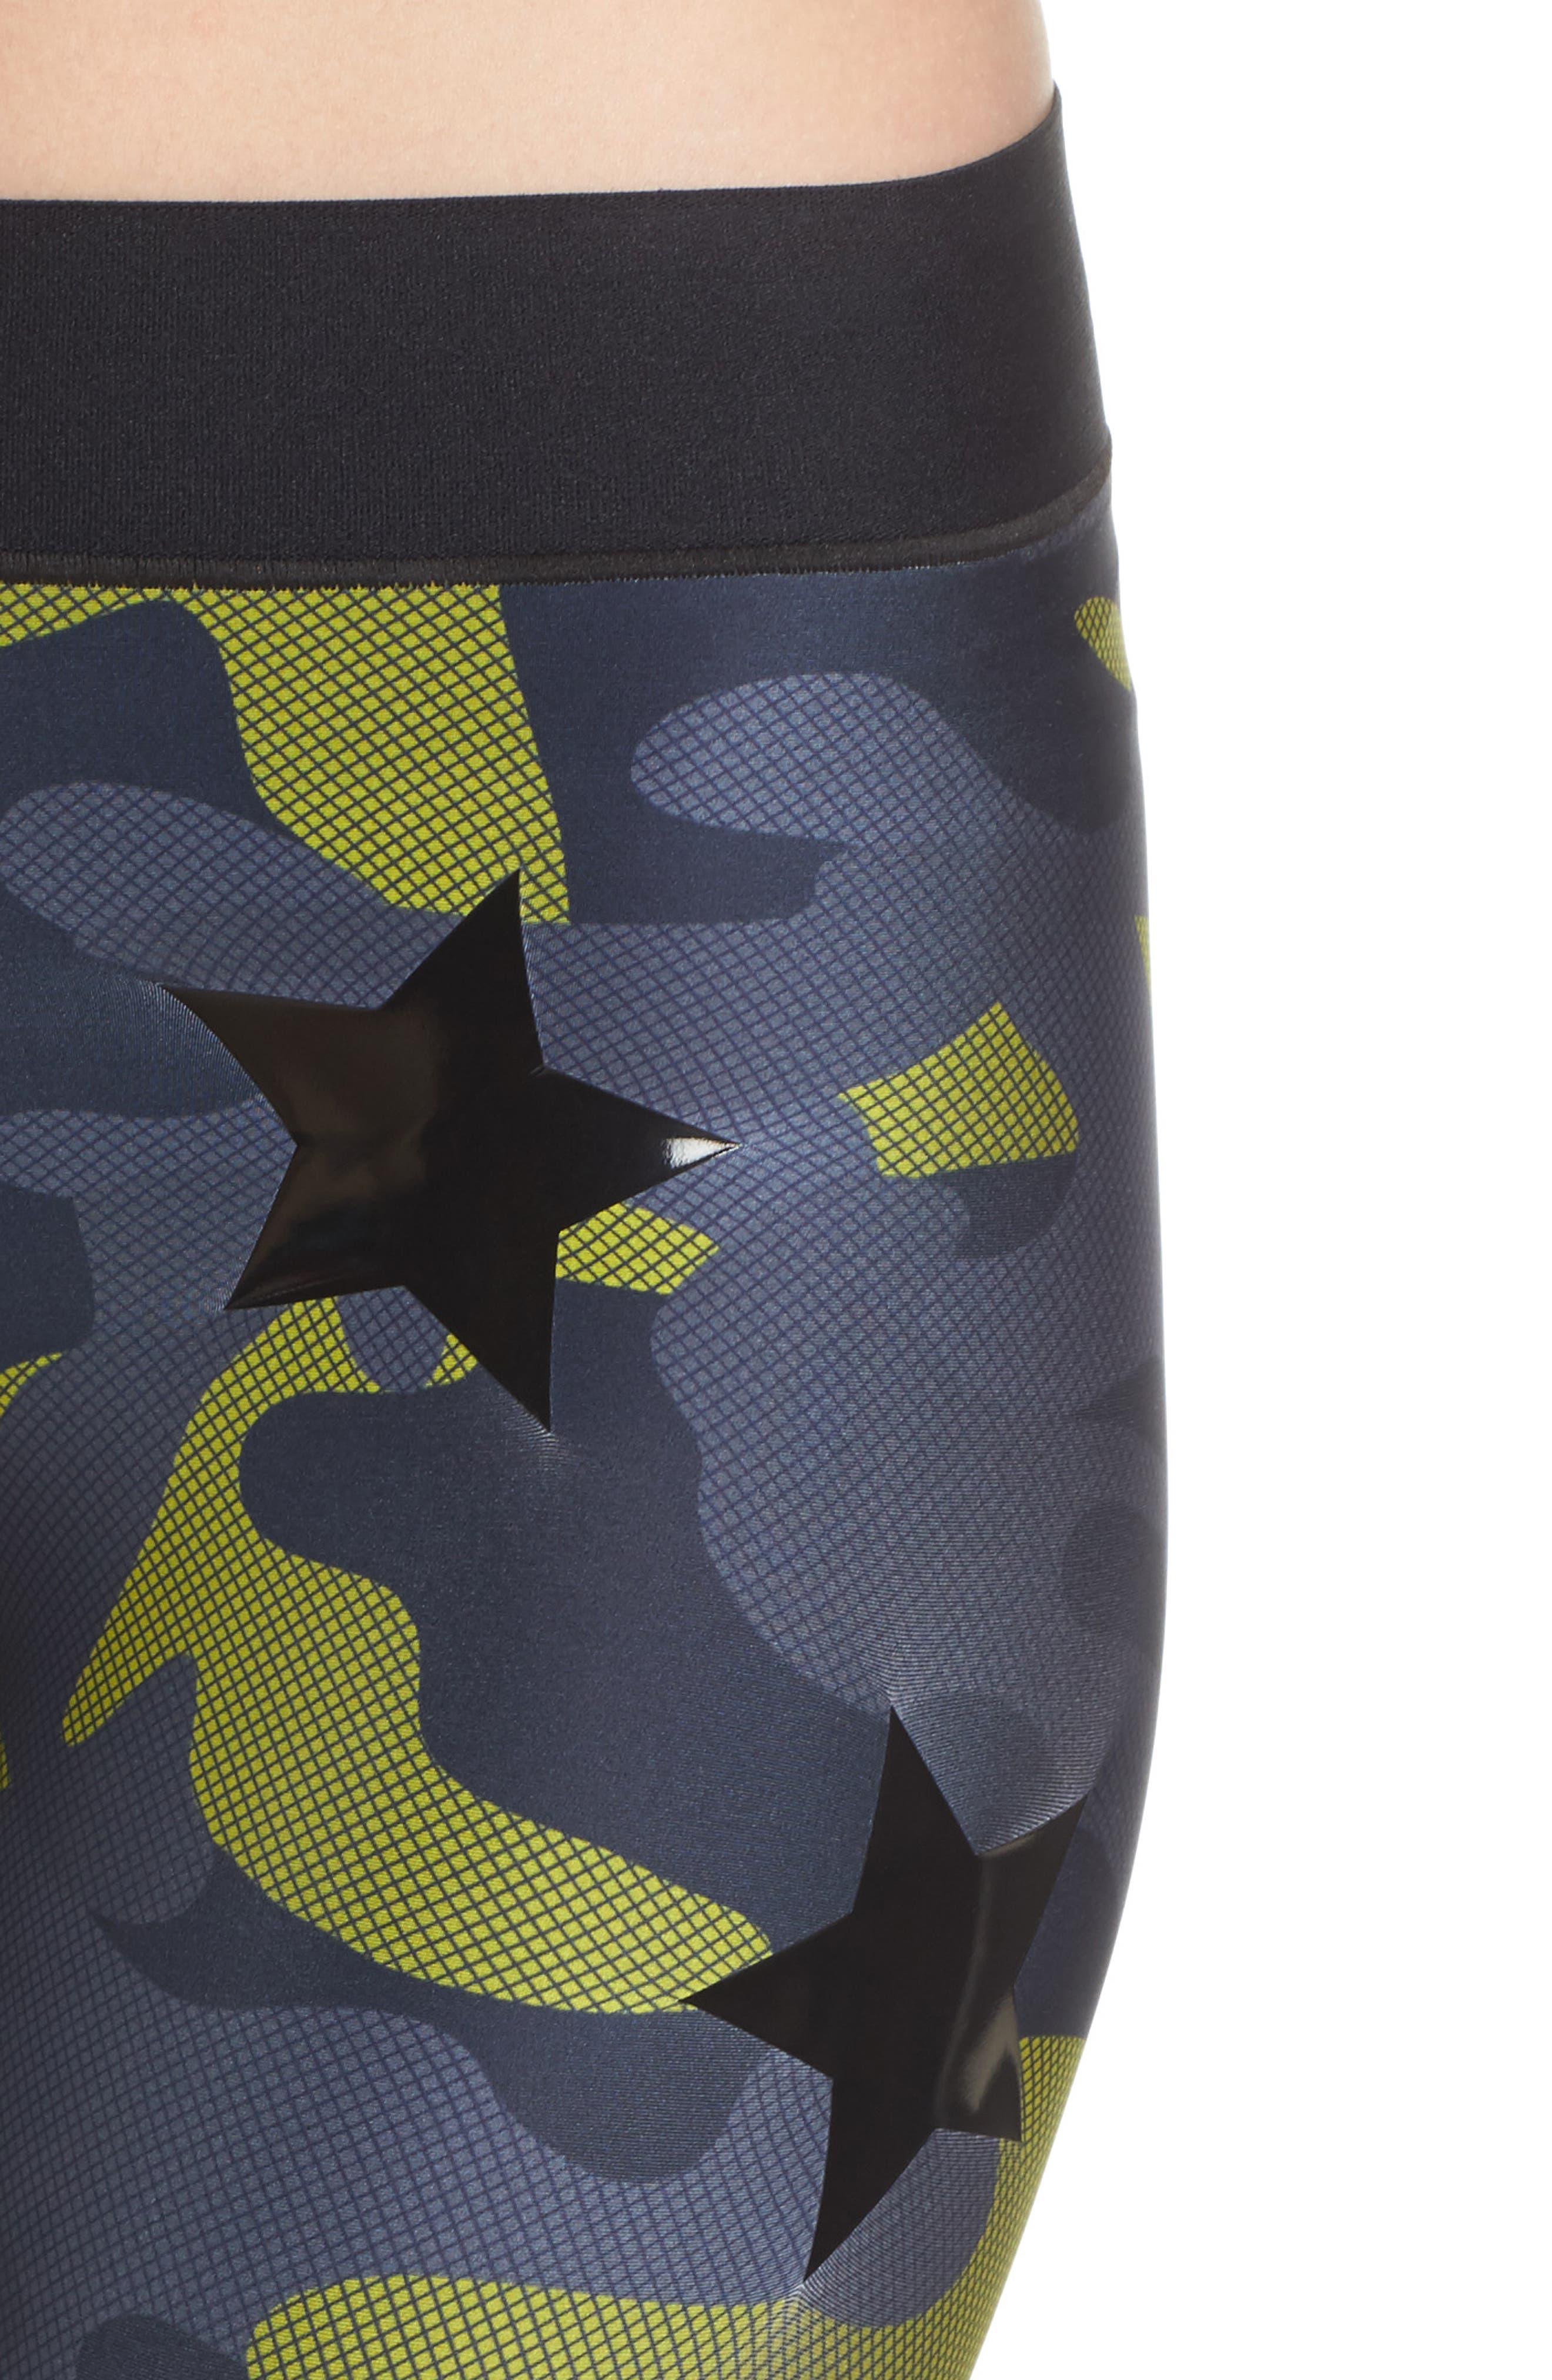 Camo Tech Knockout Leggings,                             Alternate thumbnail 4, color,                             Chartreuse/ Patent Nero